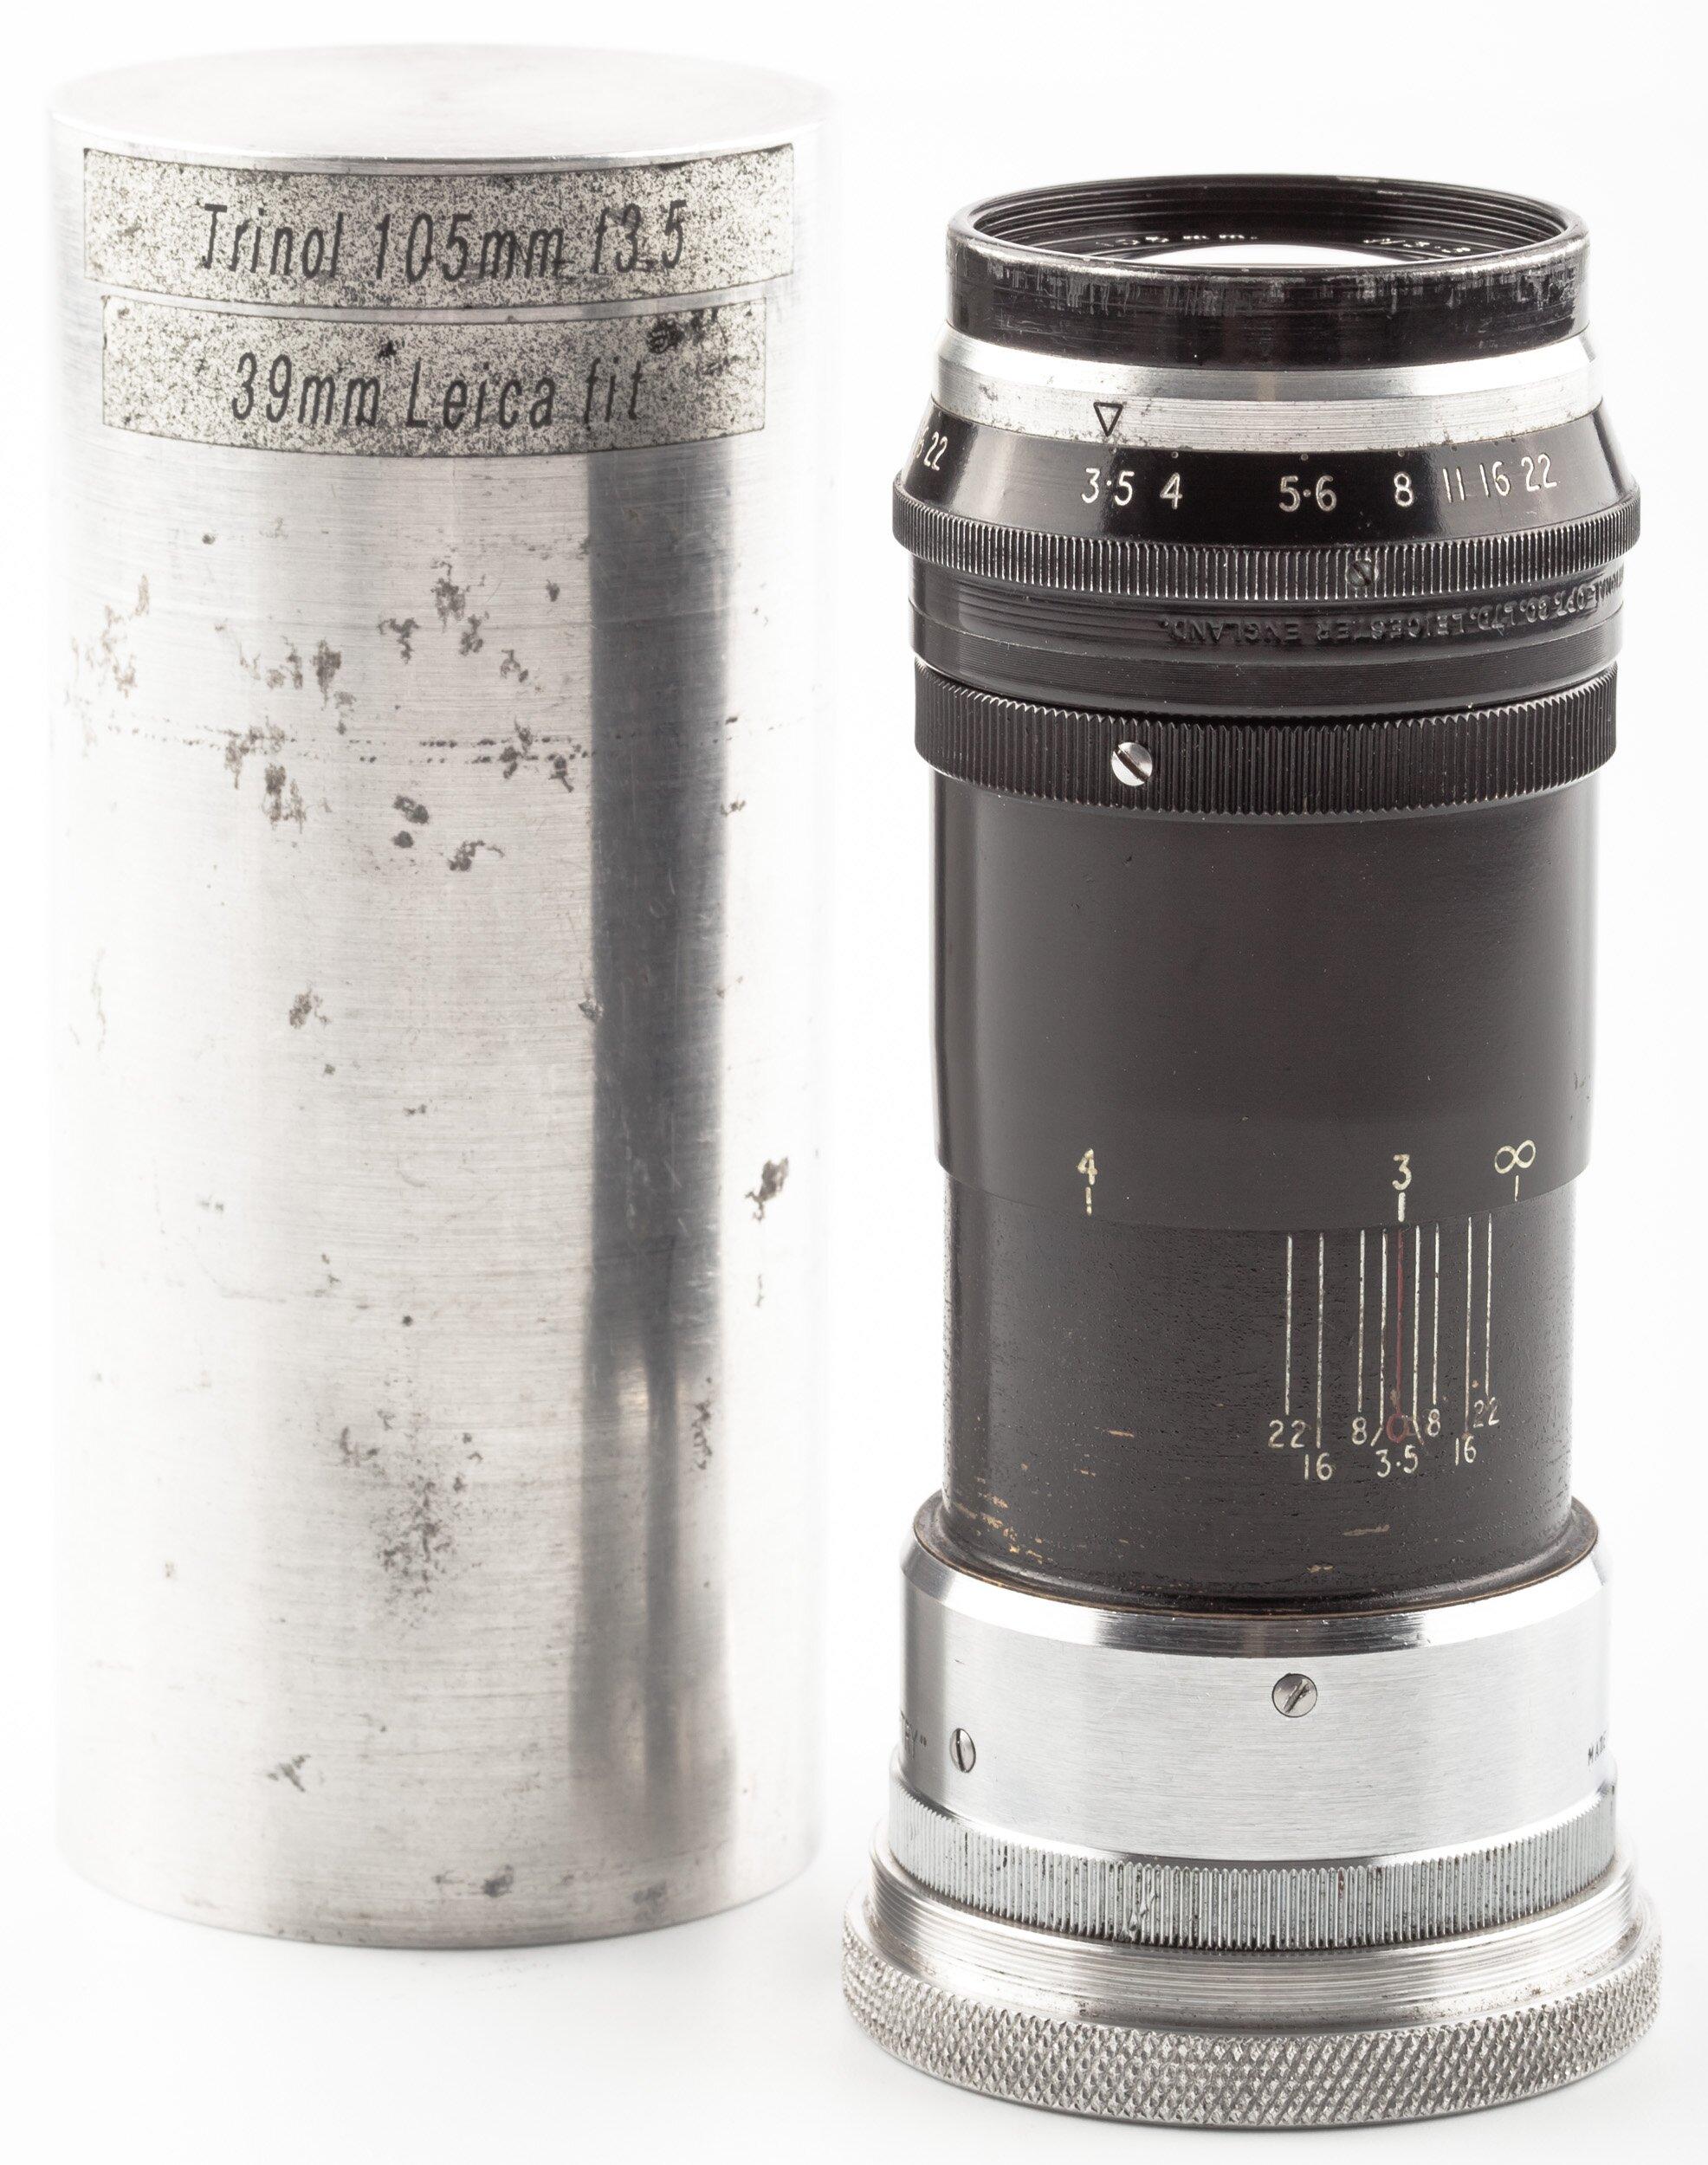 Stewartry M39 Trinol Anastigmat 3,5/105mm